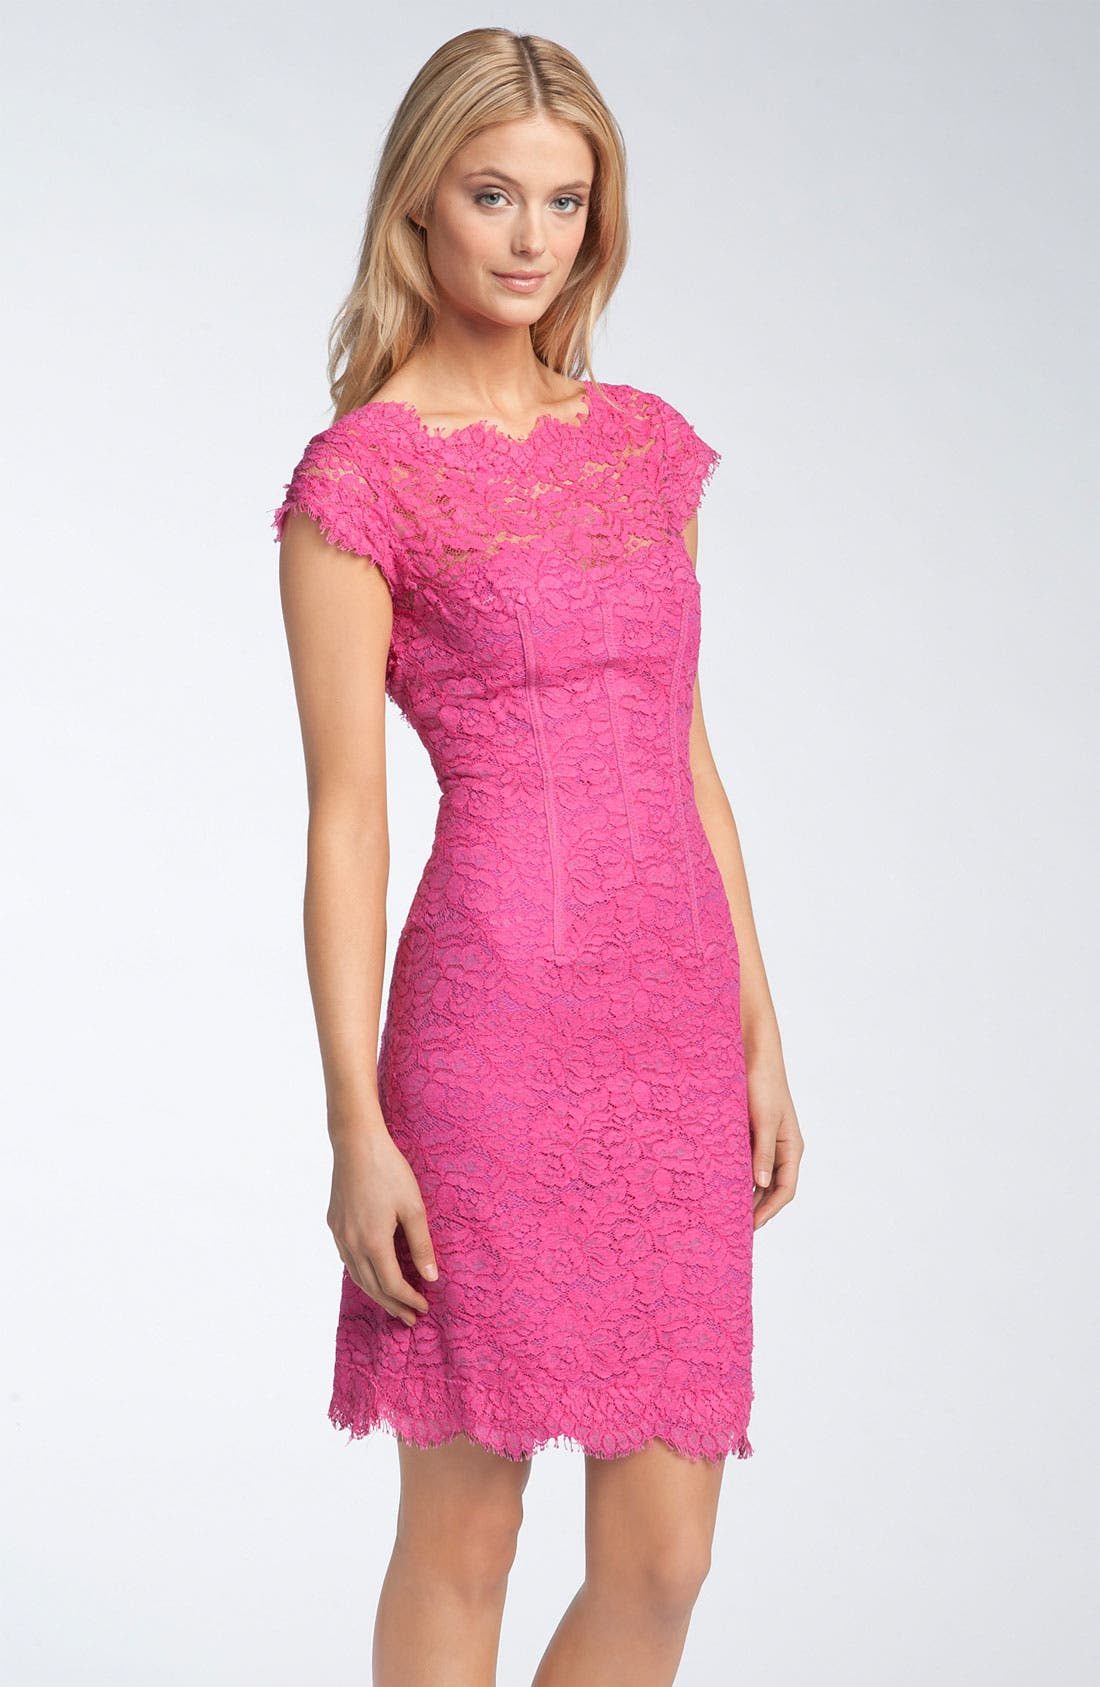 Alternate Image 1 Selected - ML Monique Lhuillier Lace Overlay Sheath Dress